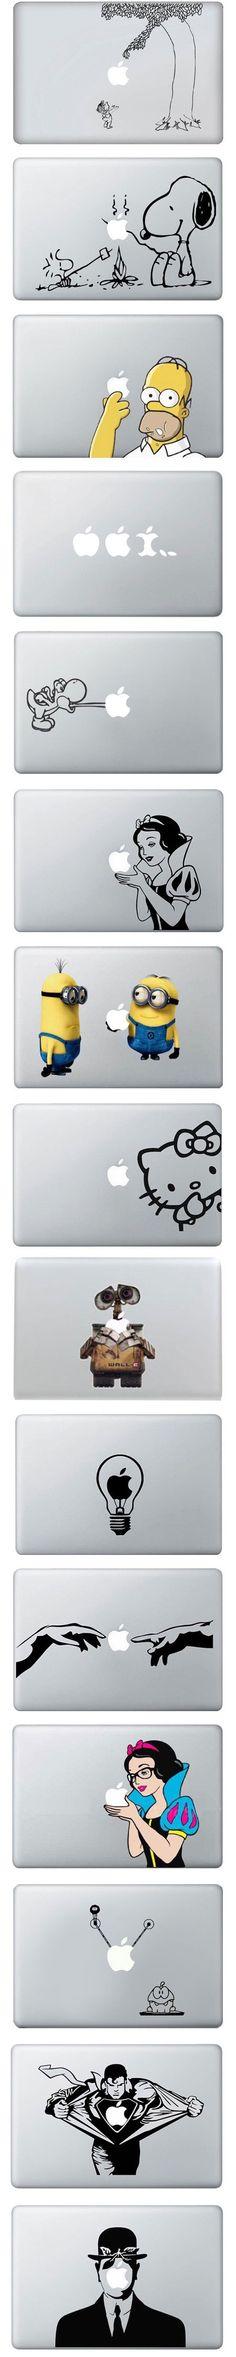 MacBook Vinyl Covers